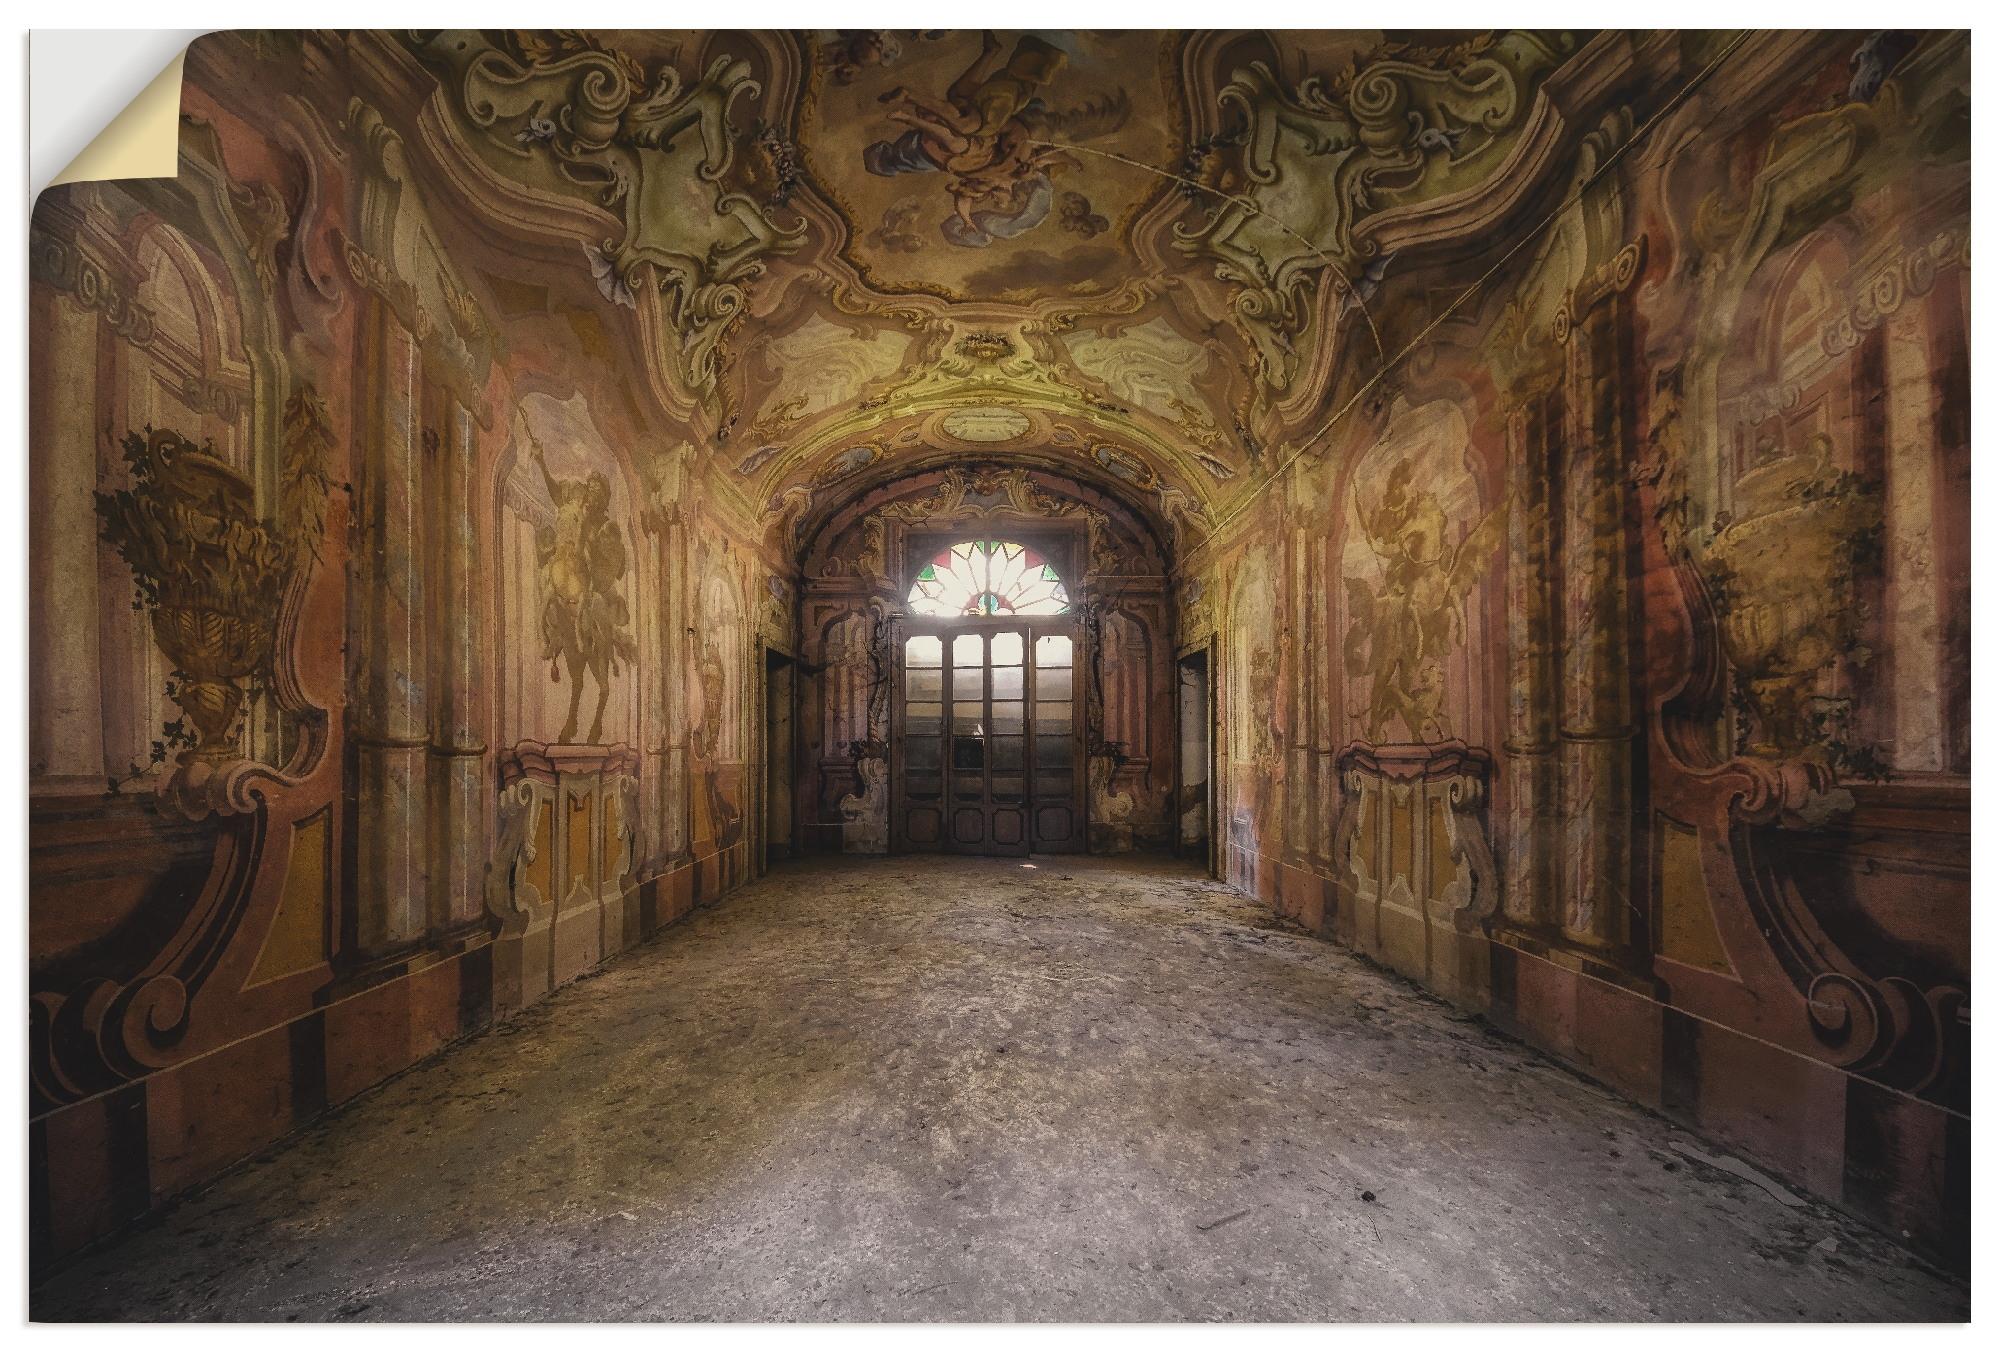 Orte aachen verlassene Lost Places: